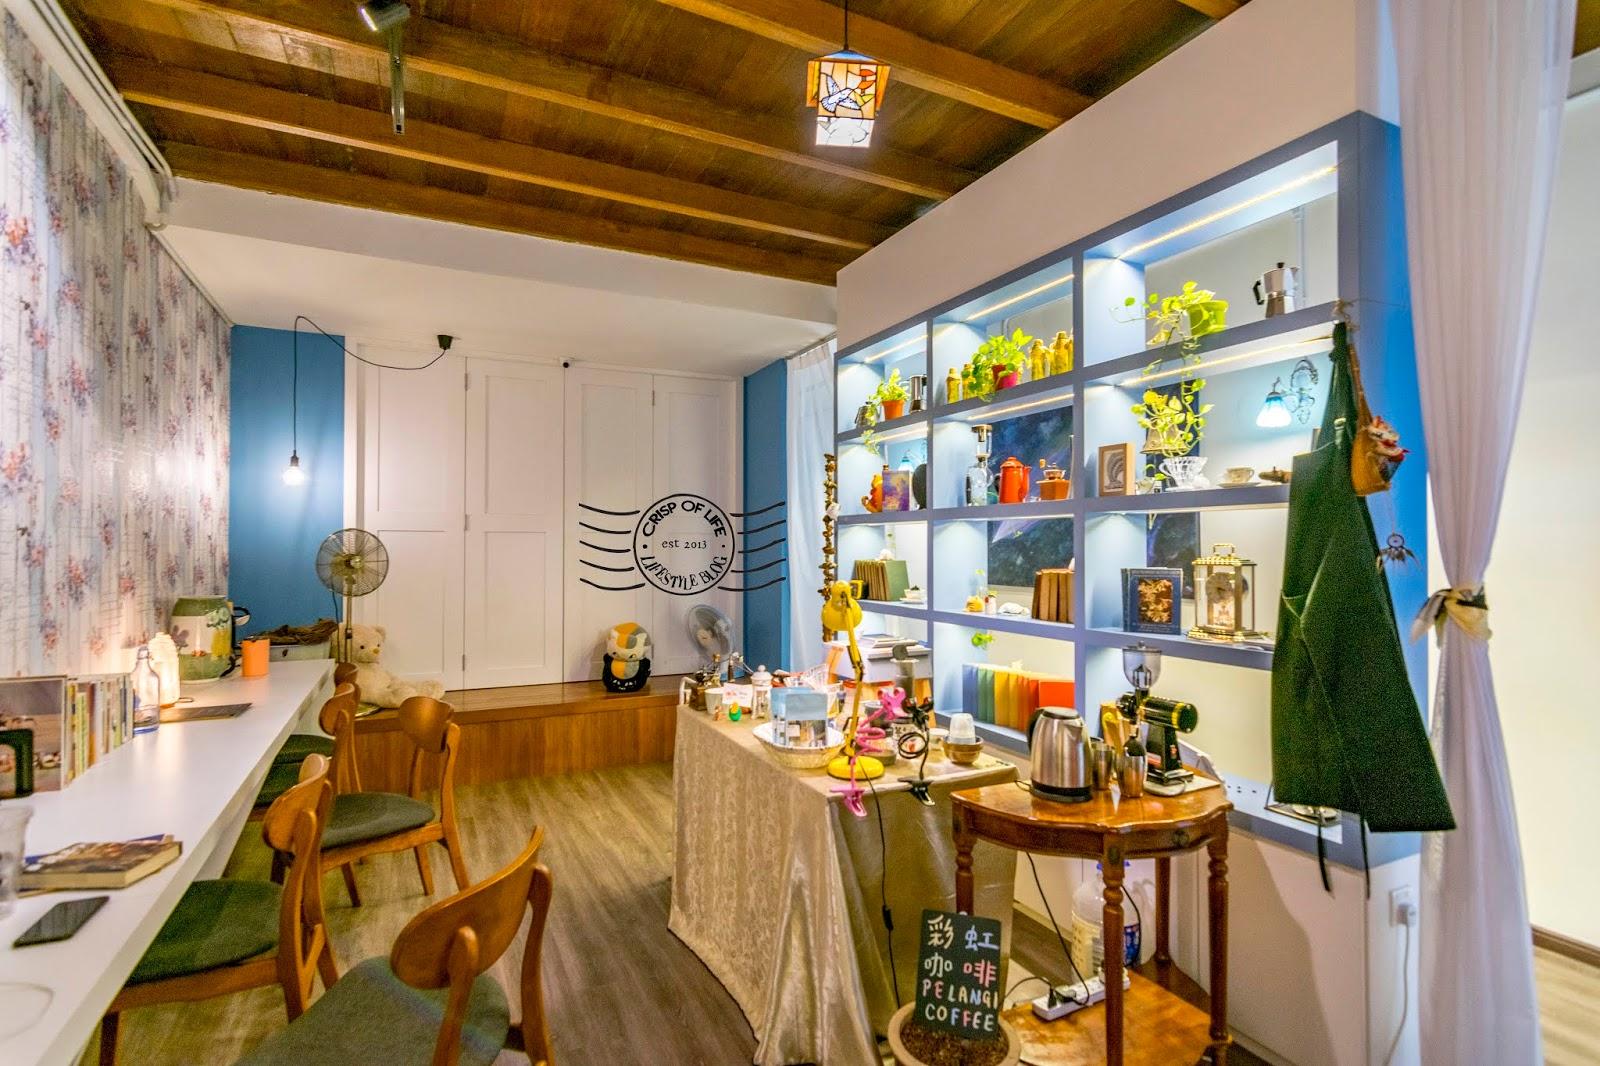 The Blue Vegan Restaurant - A Western Asian Fusion Vegan Restaurant @ Lebuh Tye Sin, Georgetown, Penang